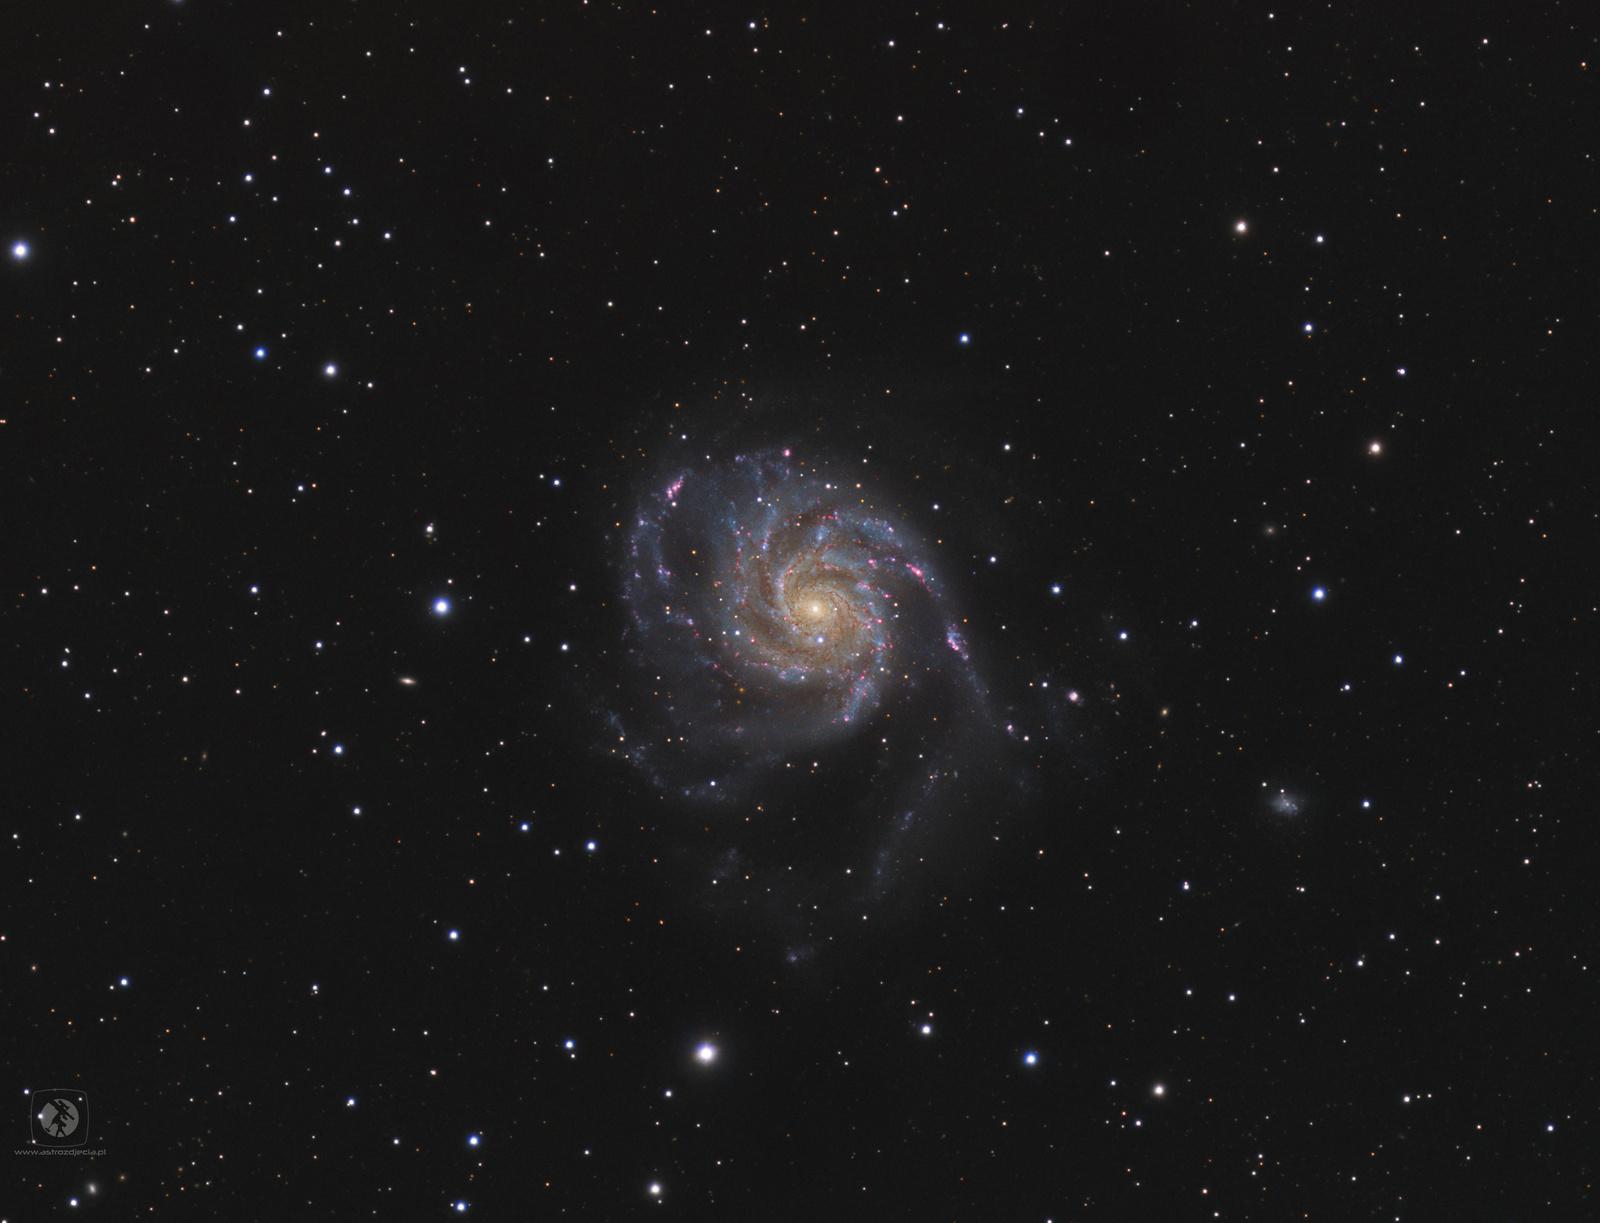 M101-gotowe2.thumb.jpg.68e6a0d77c260737cb3e7a93f7517b91.jpg